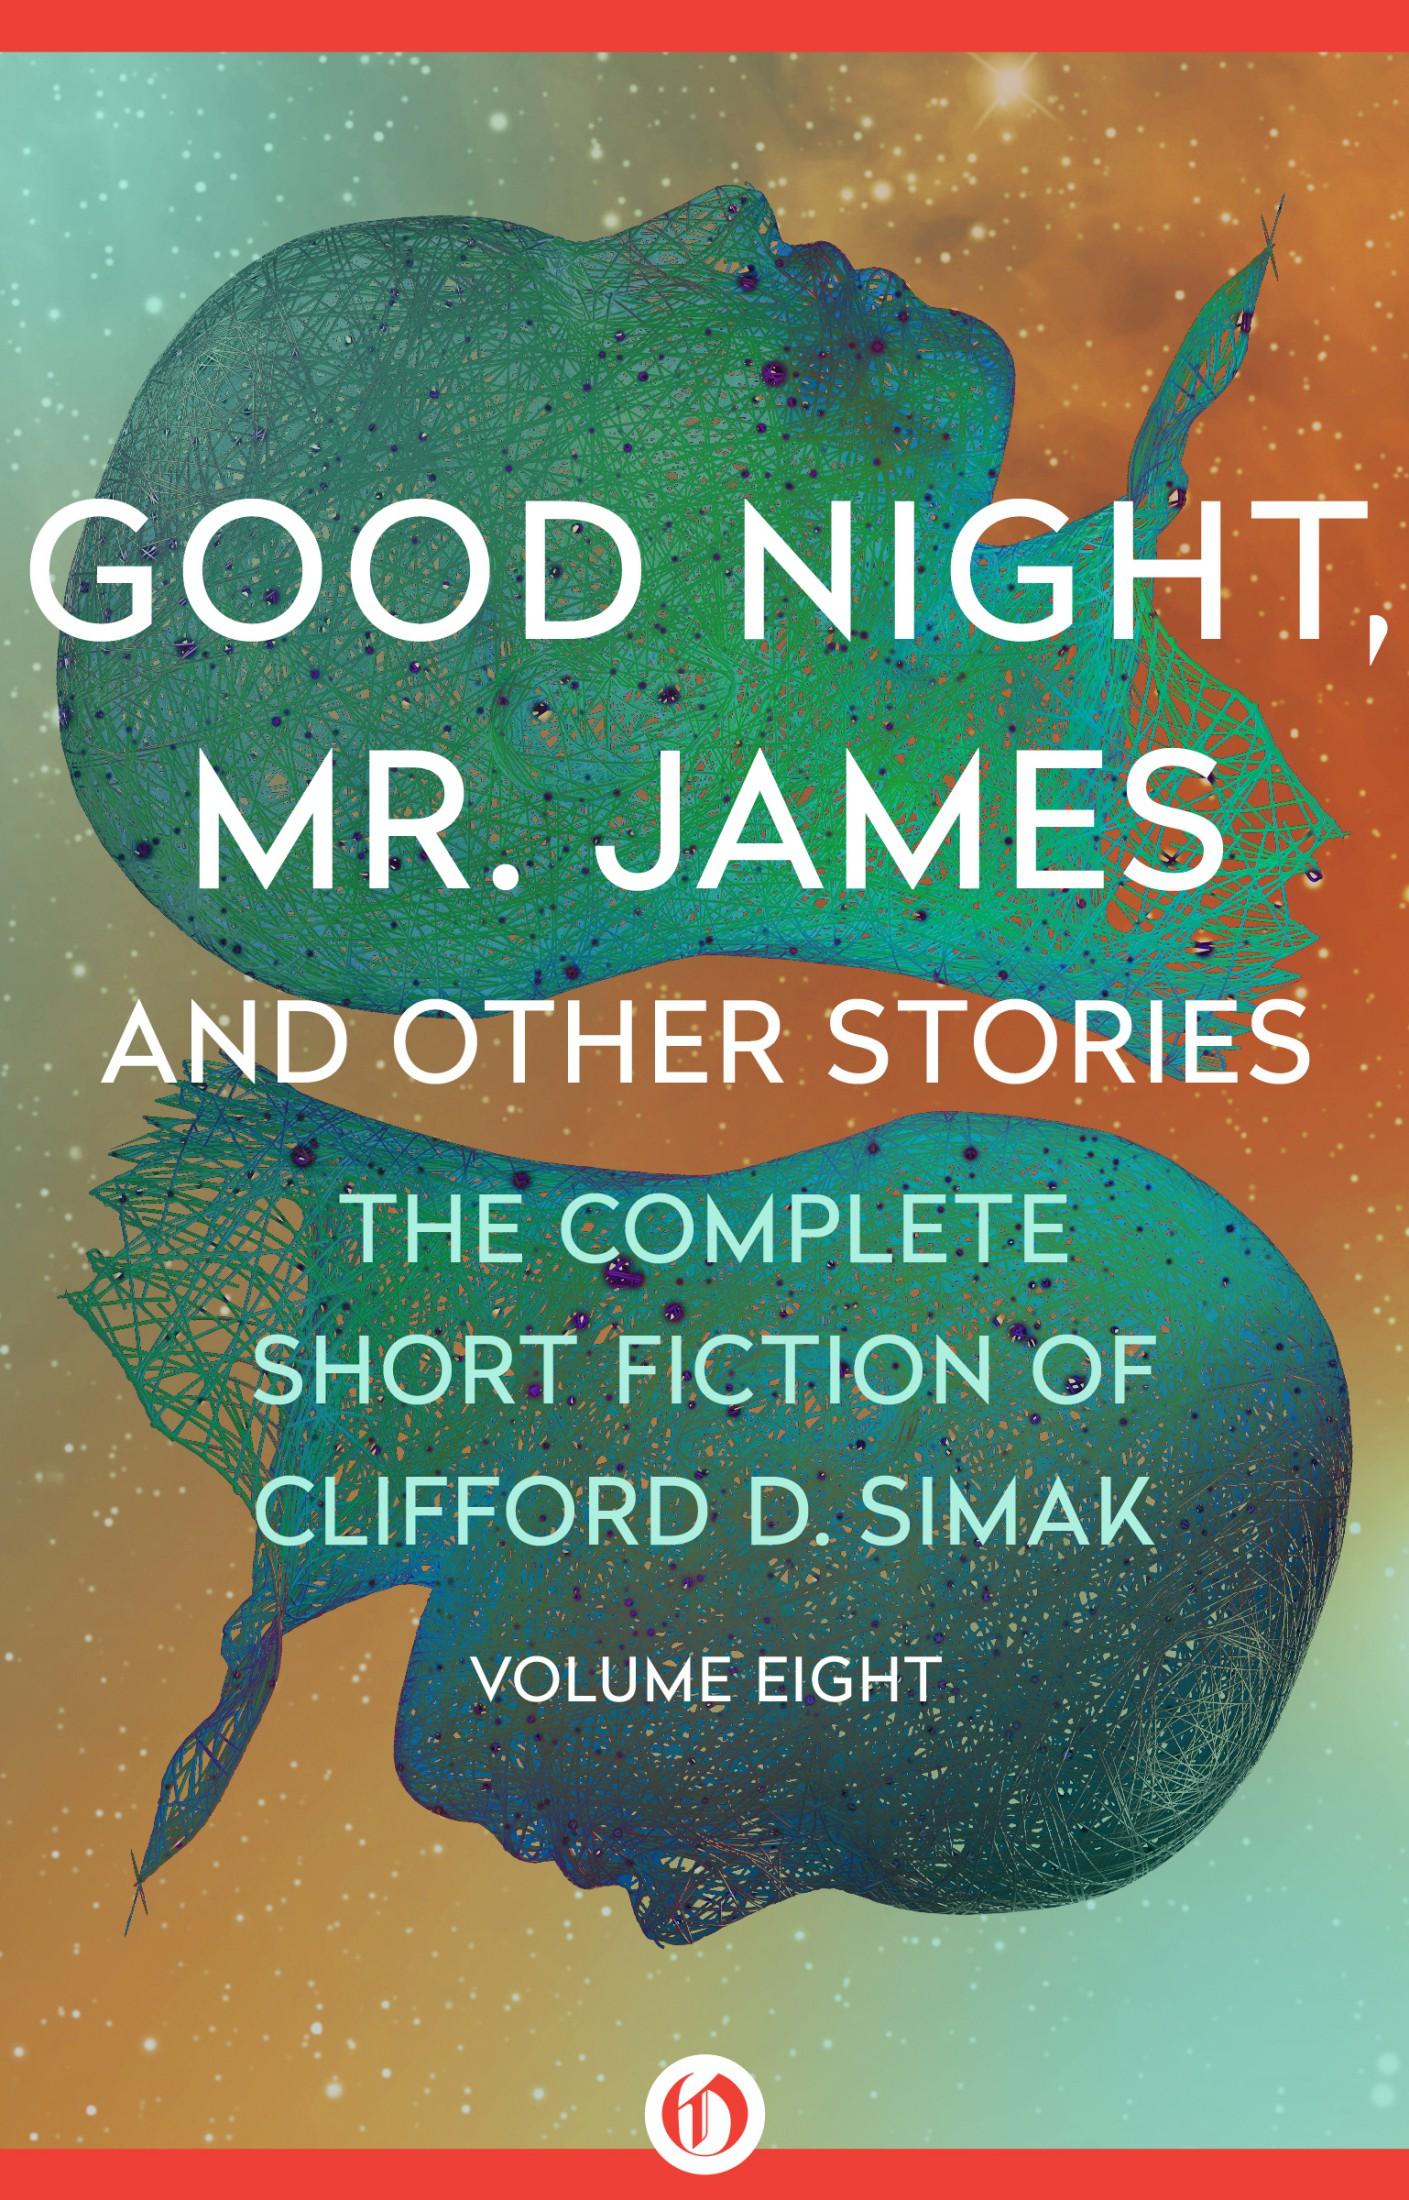 Good Night, Mr. James